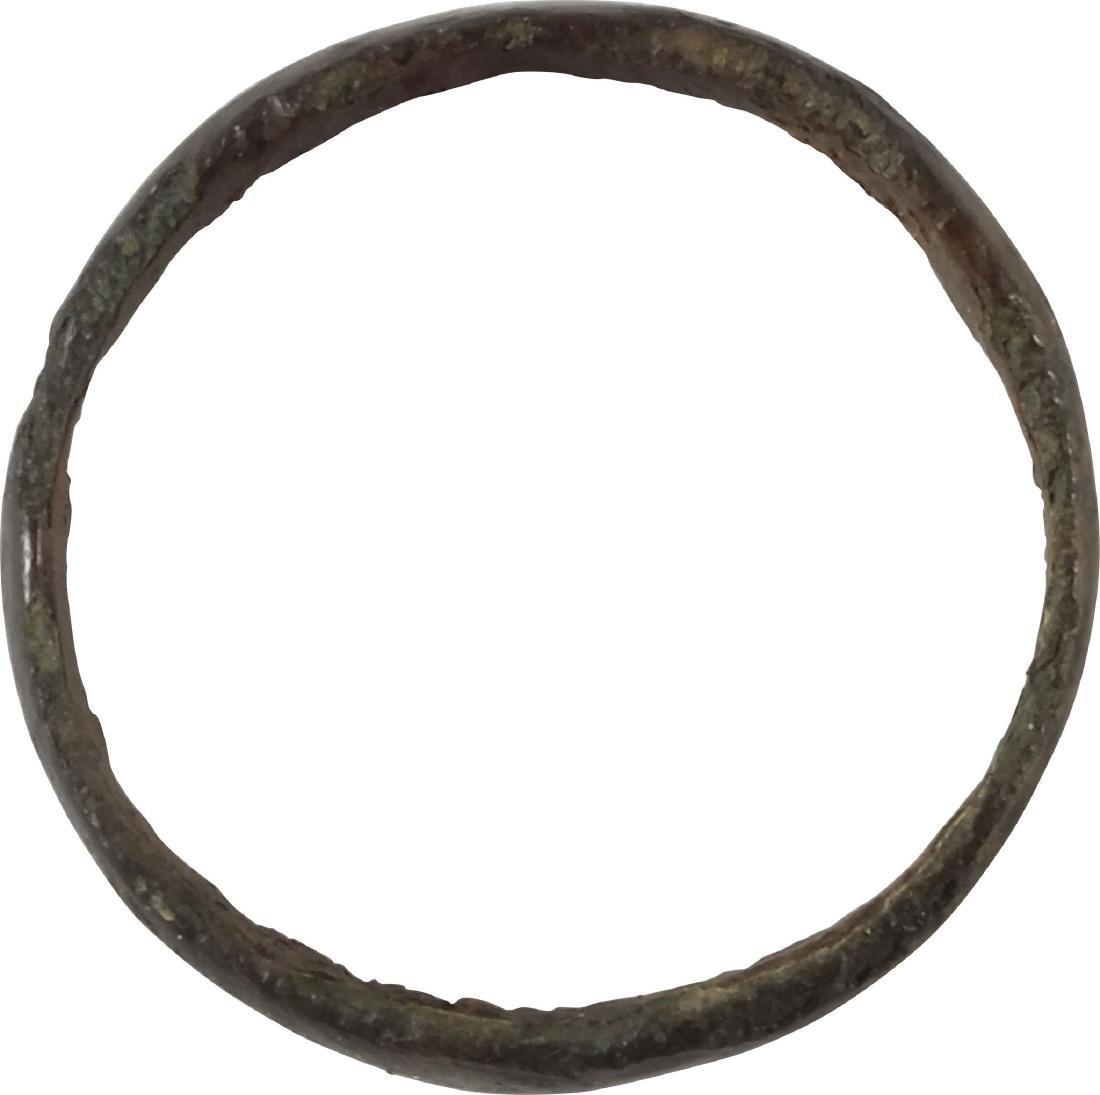 VIKING WEDDING RING, 9th-10th CENTURY AD - 2